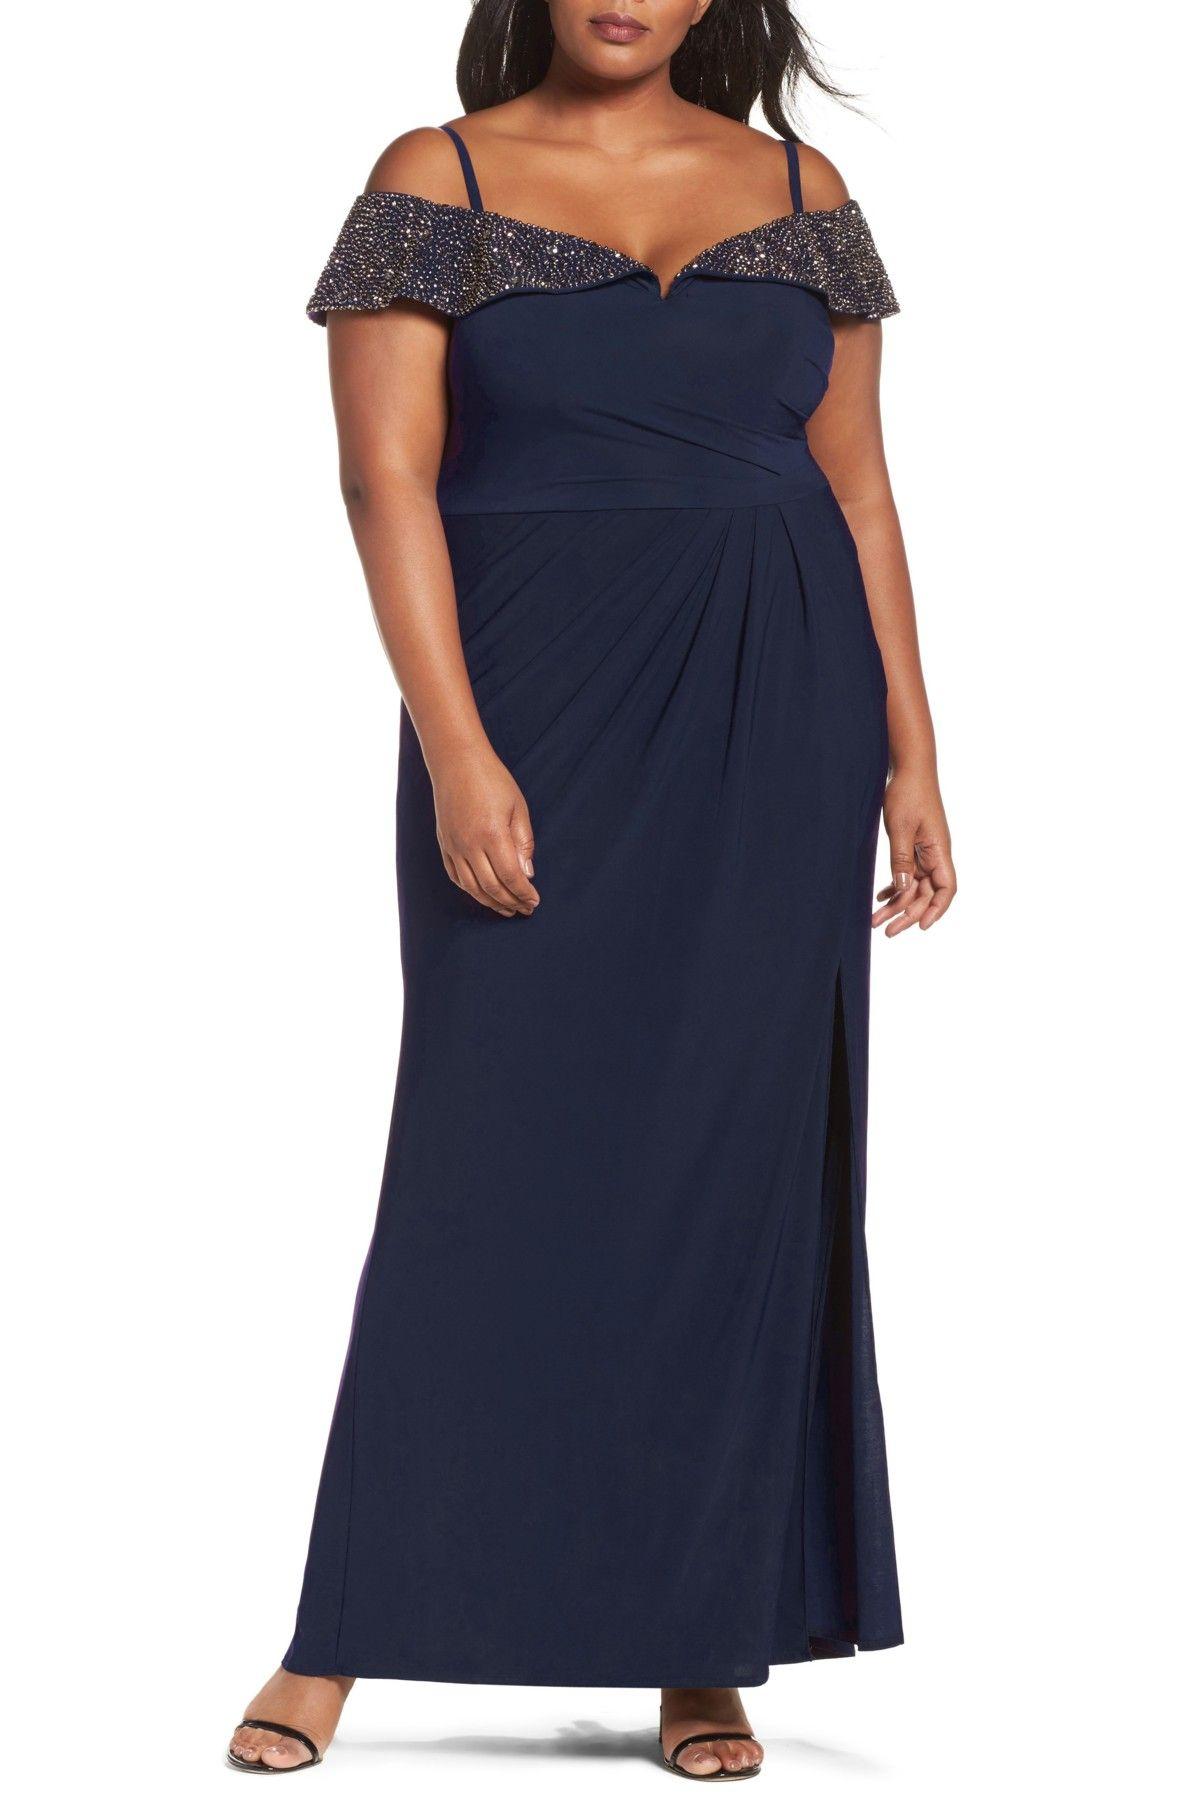 Xscape Beaded Neck Empire Gown Plus Size Nordstrom Plus Size Outfits Plus Size Dresses Gowns [ 1687 x 1100 Pixel ]